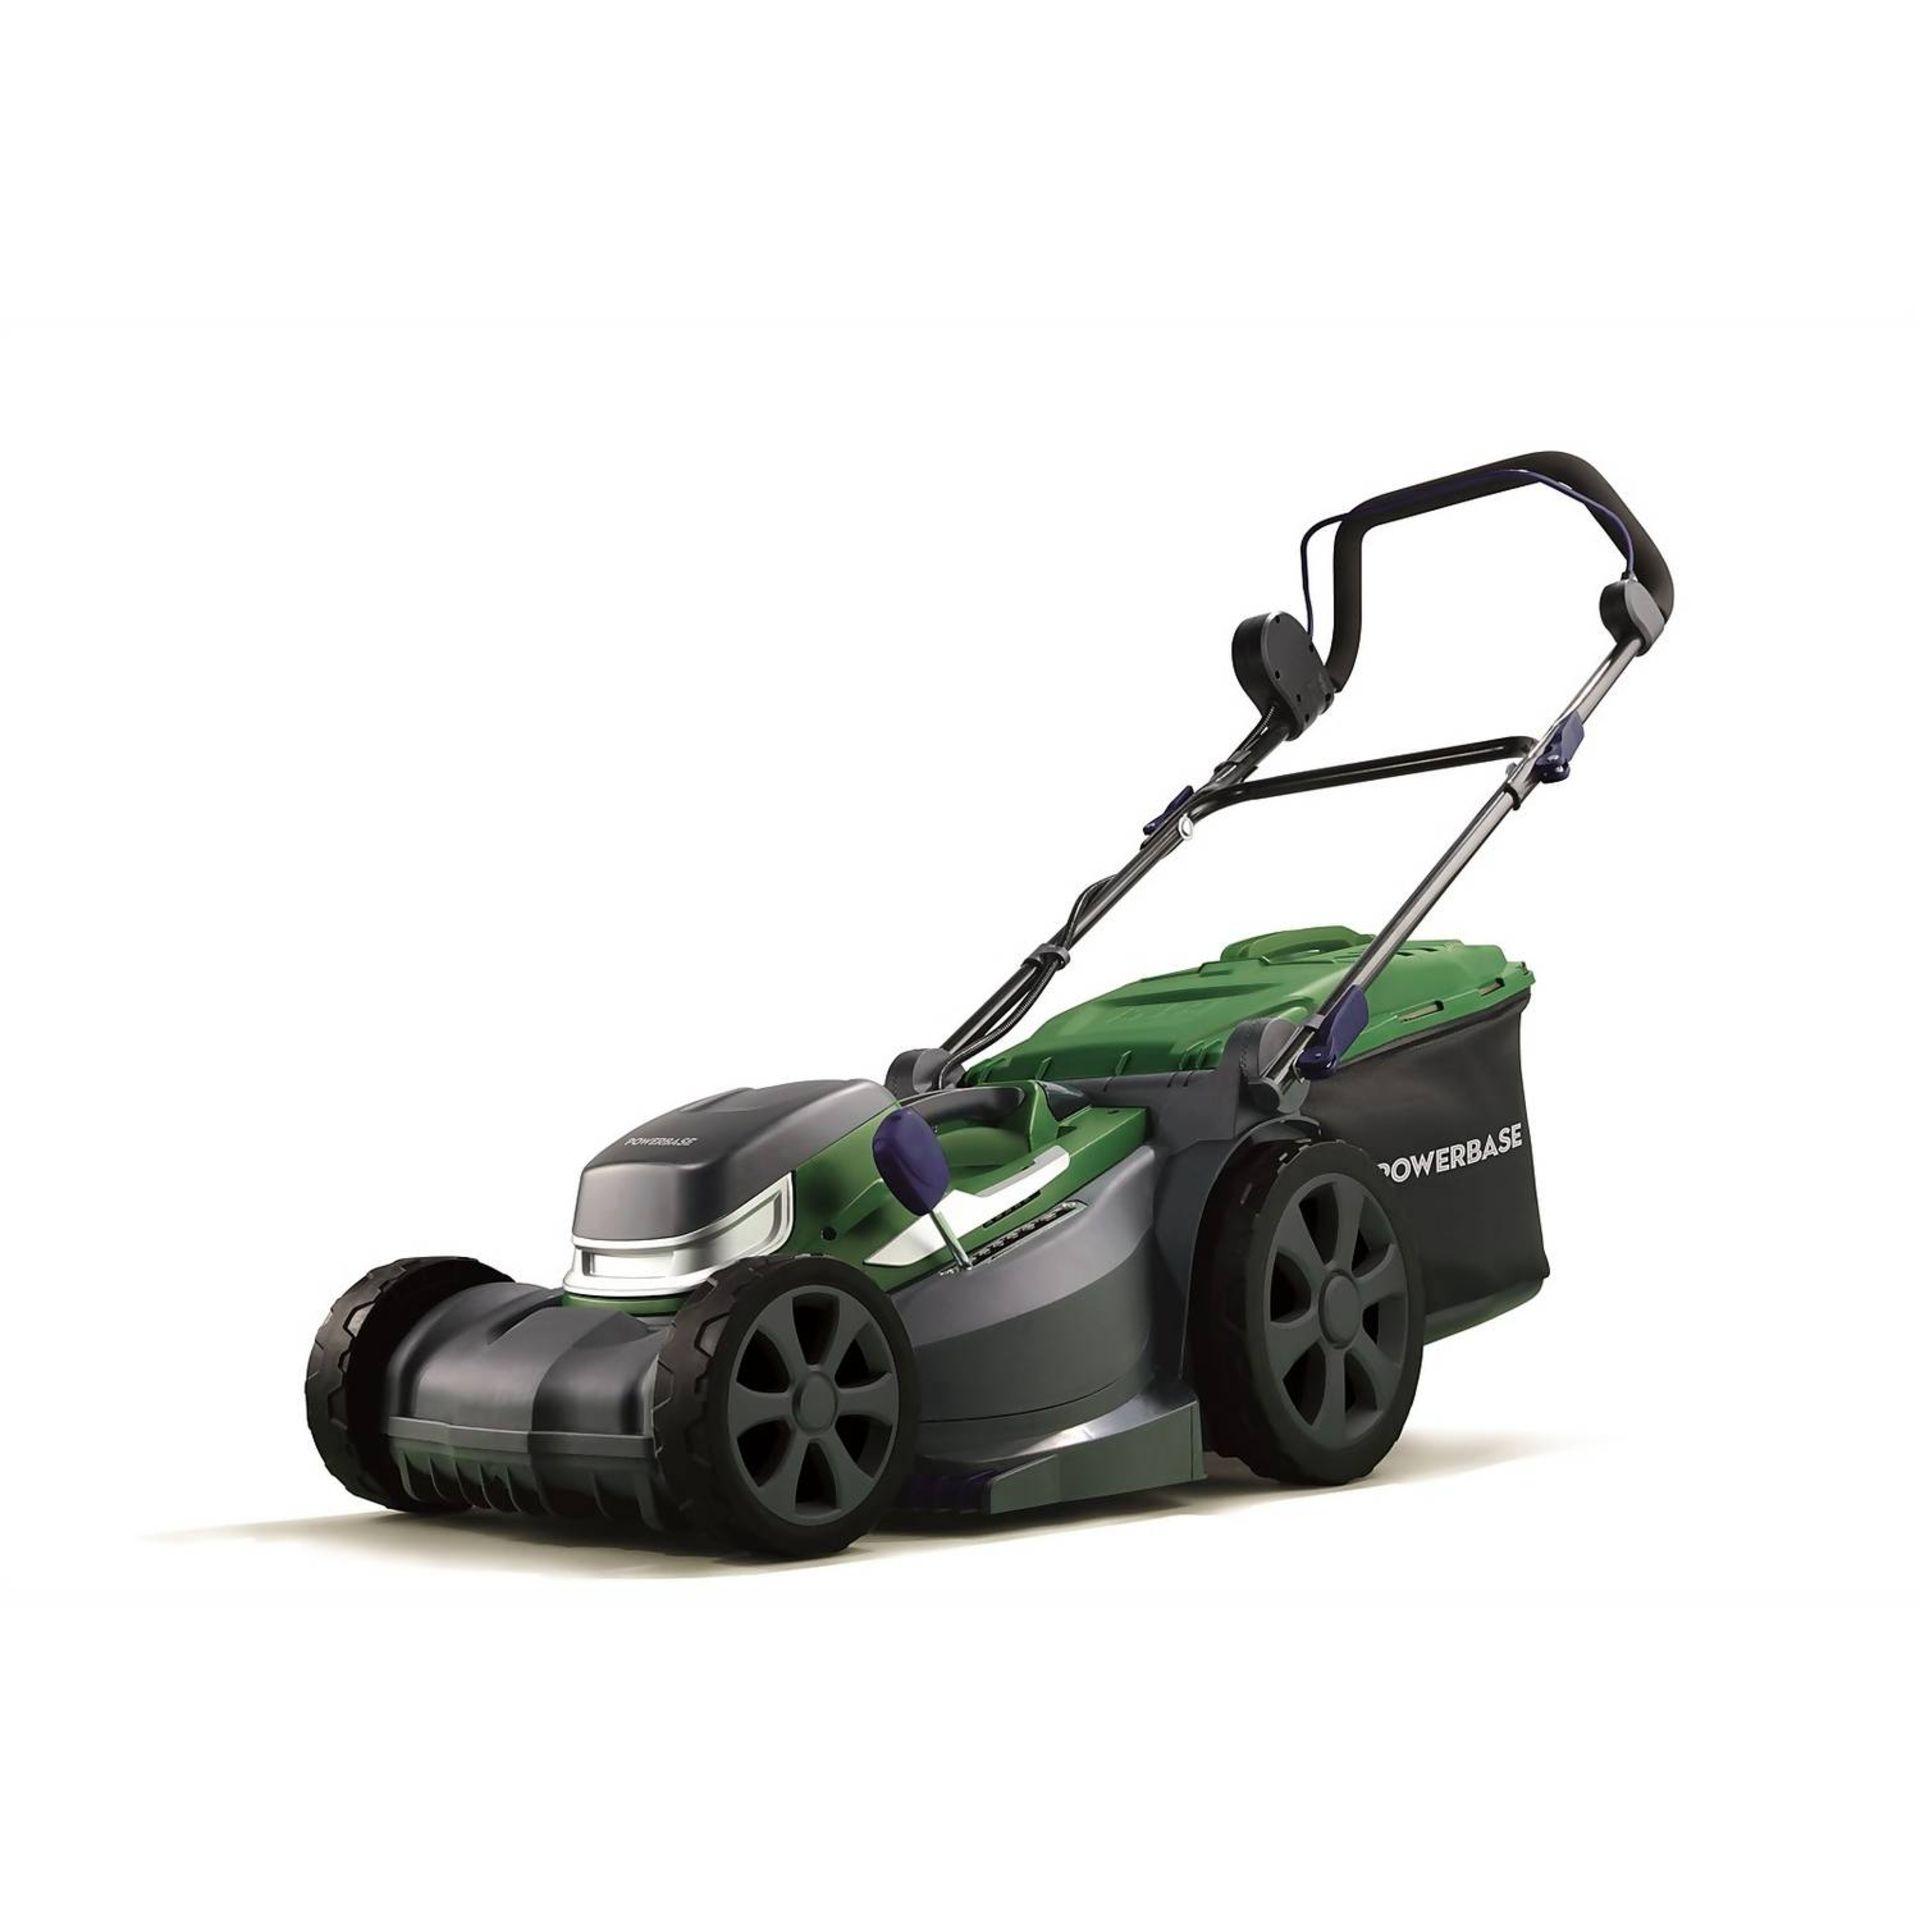 (P7) 1x Powerbase 37cm 40V Cordless Lawn Mower RRP £229. New, Sealed Unit.